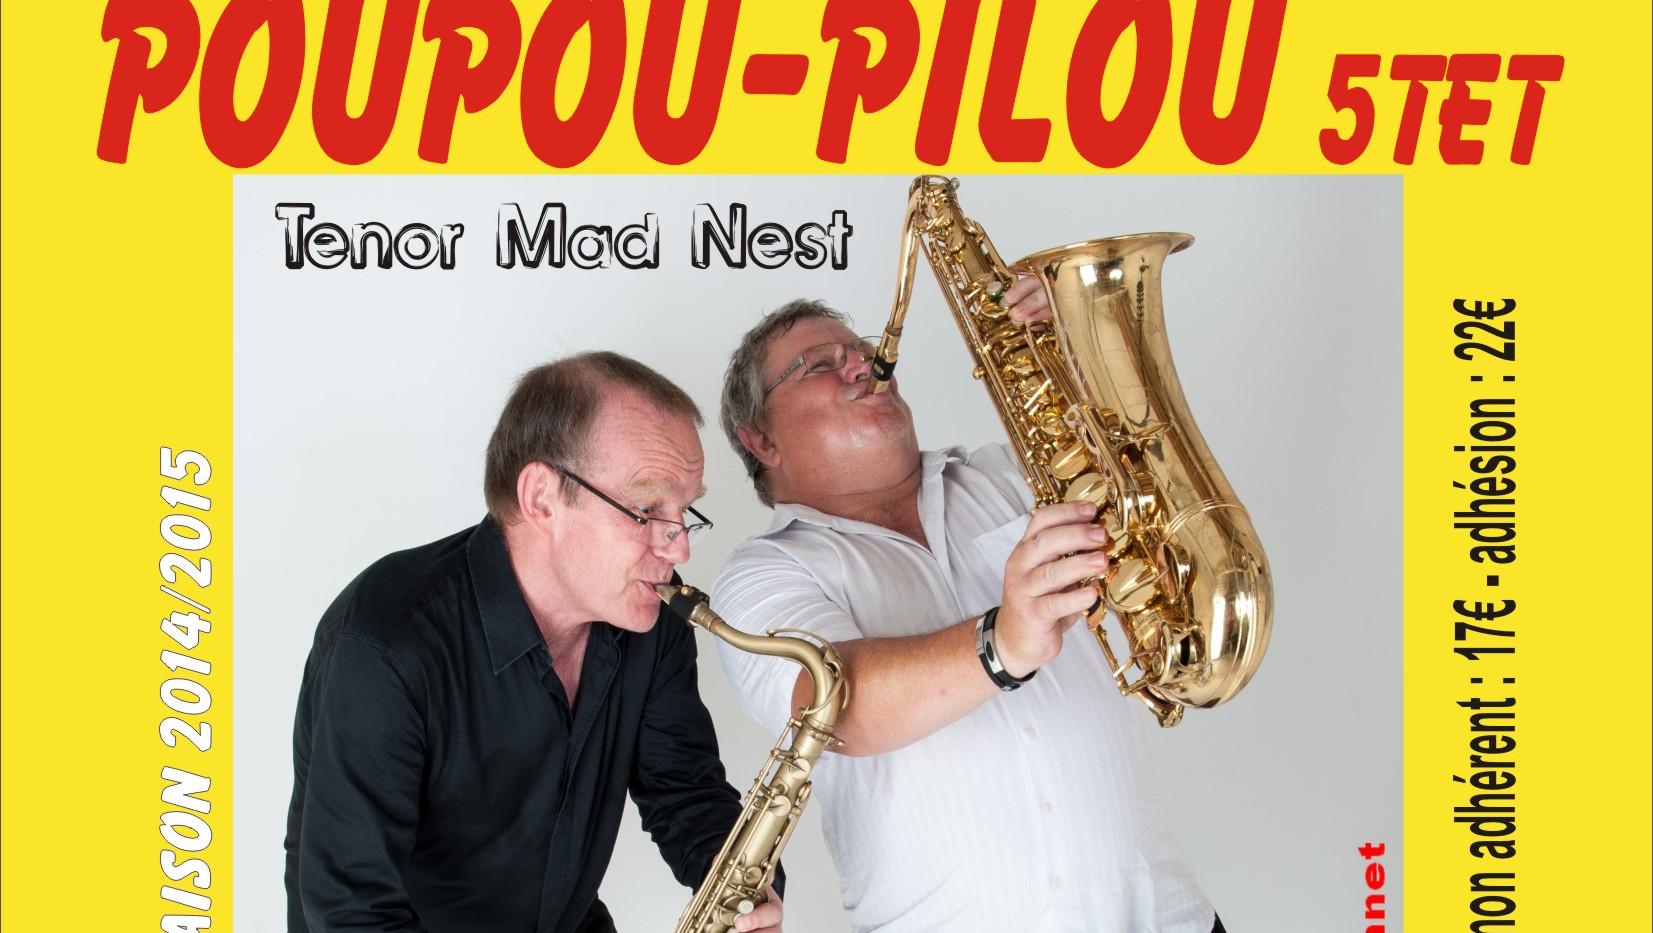 Jazz_au_Blanc__mardi_3_février_P oupou-P